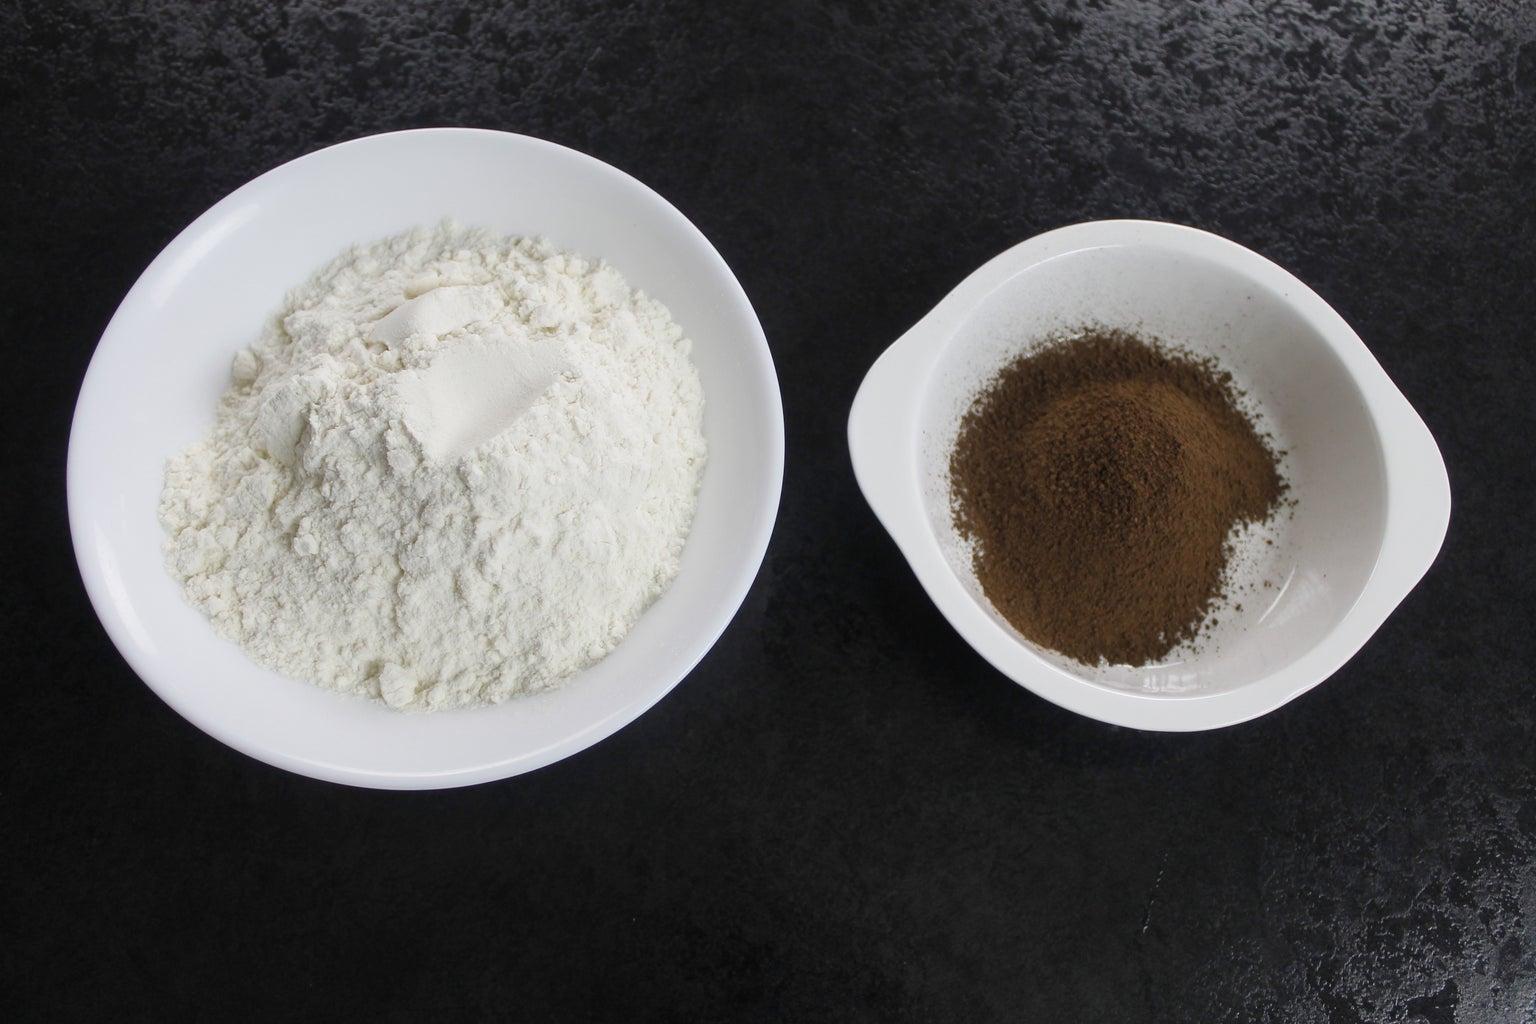 Flour and Cocoa